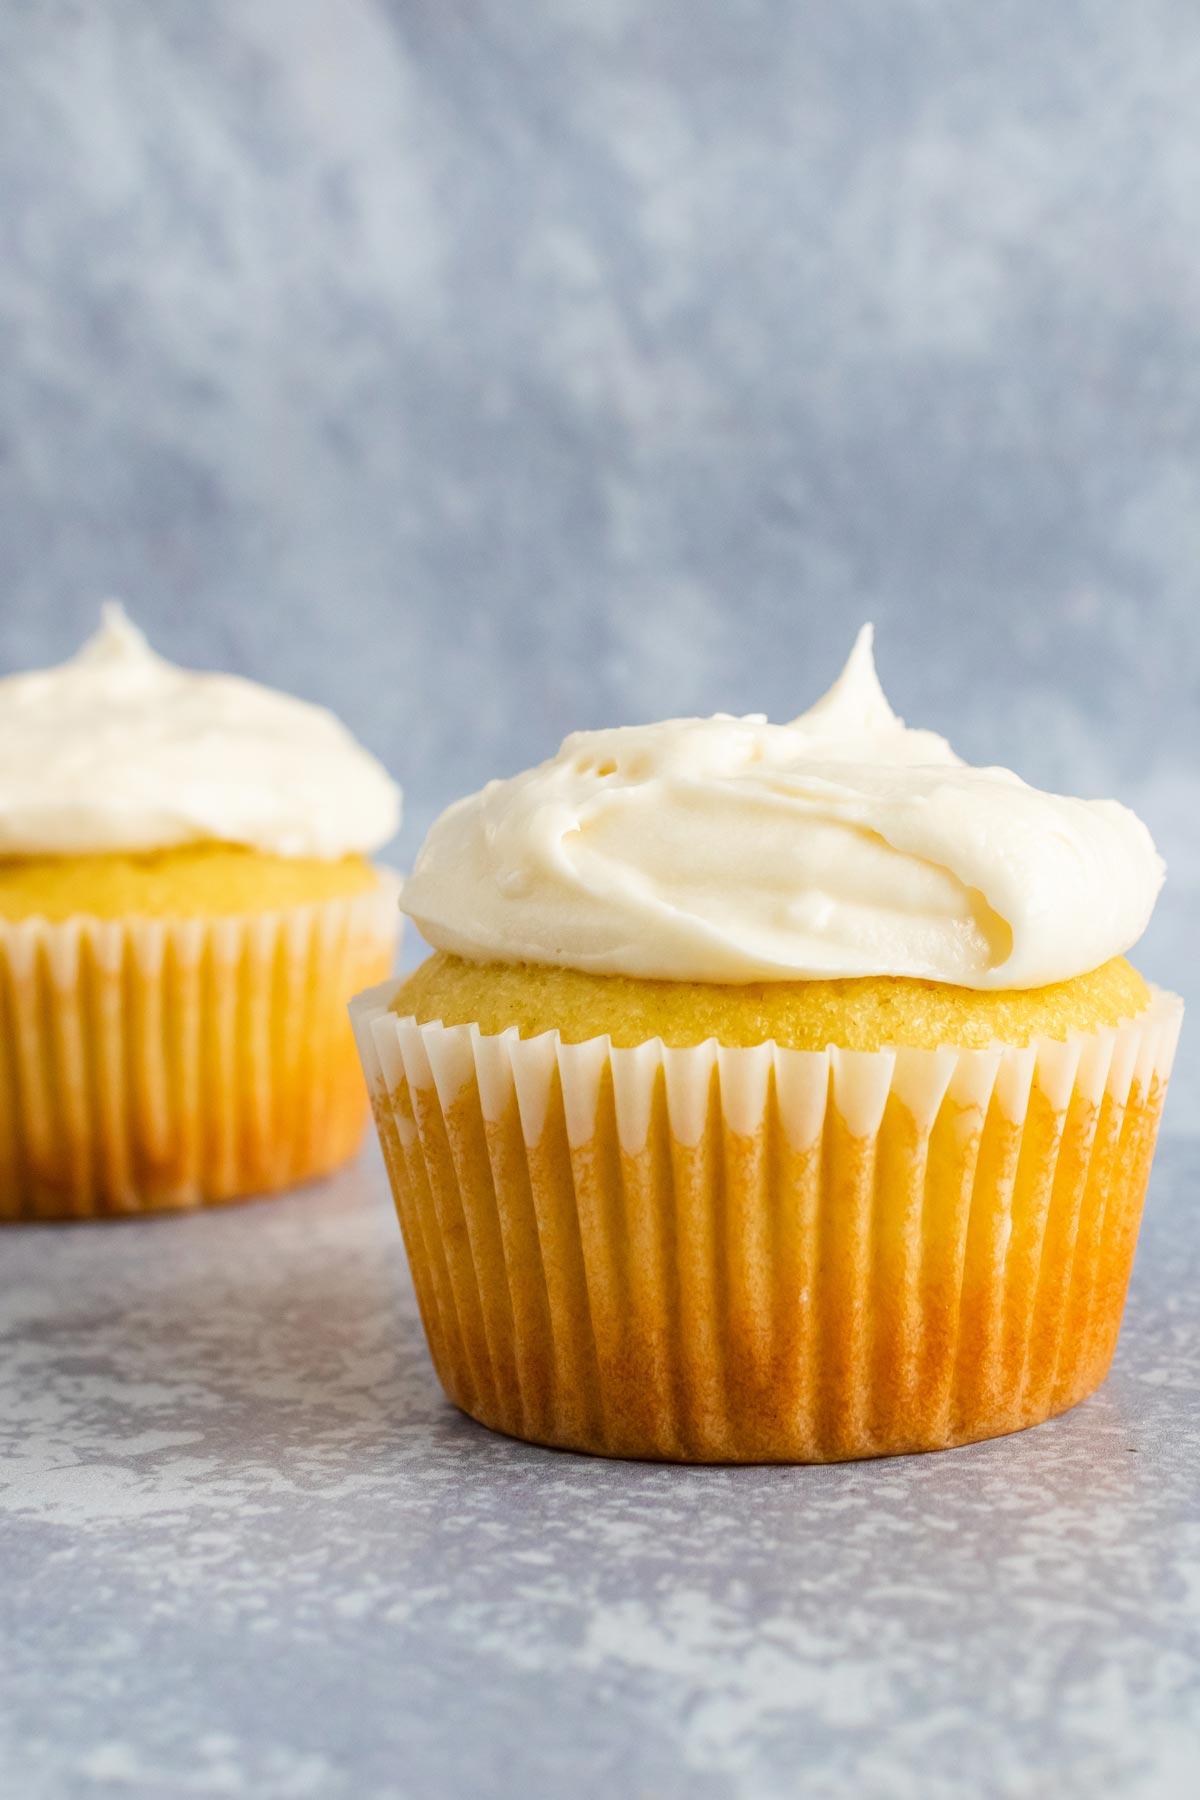 A vanilla cupcake topped with vanilla icing.